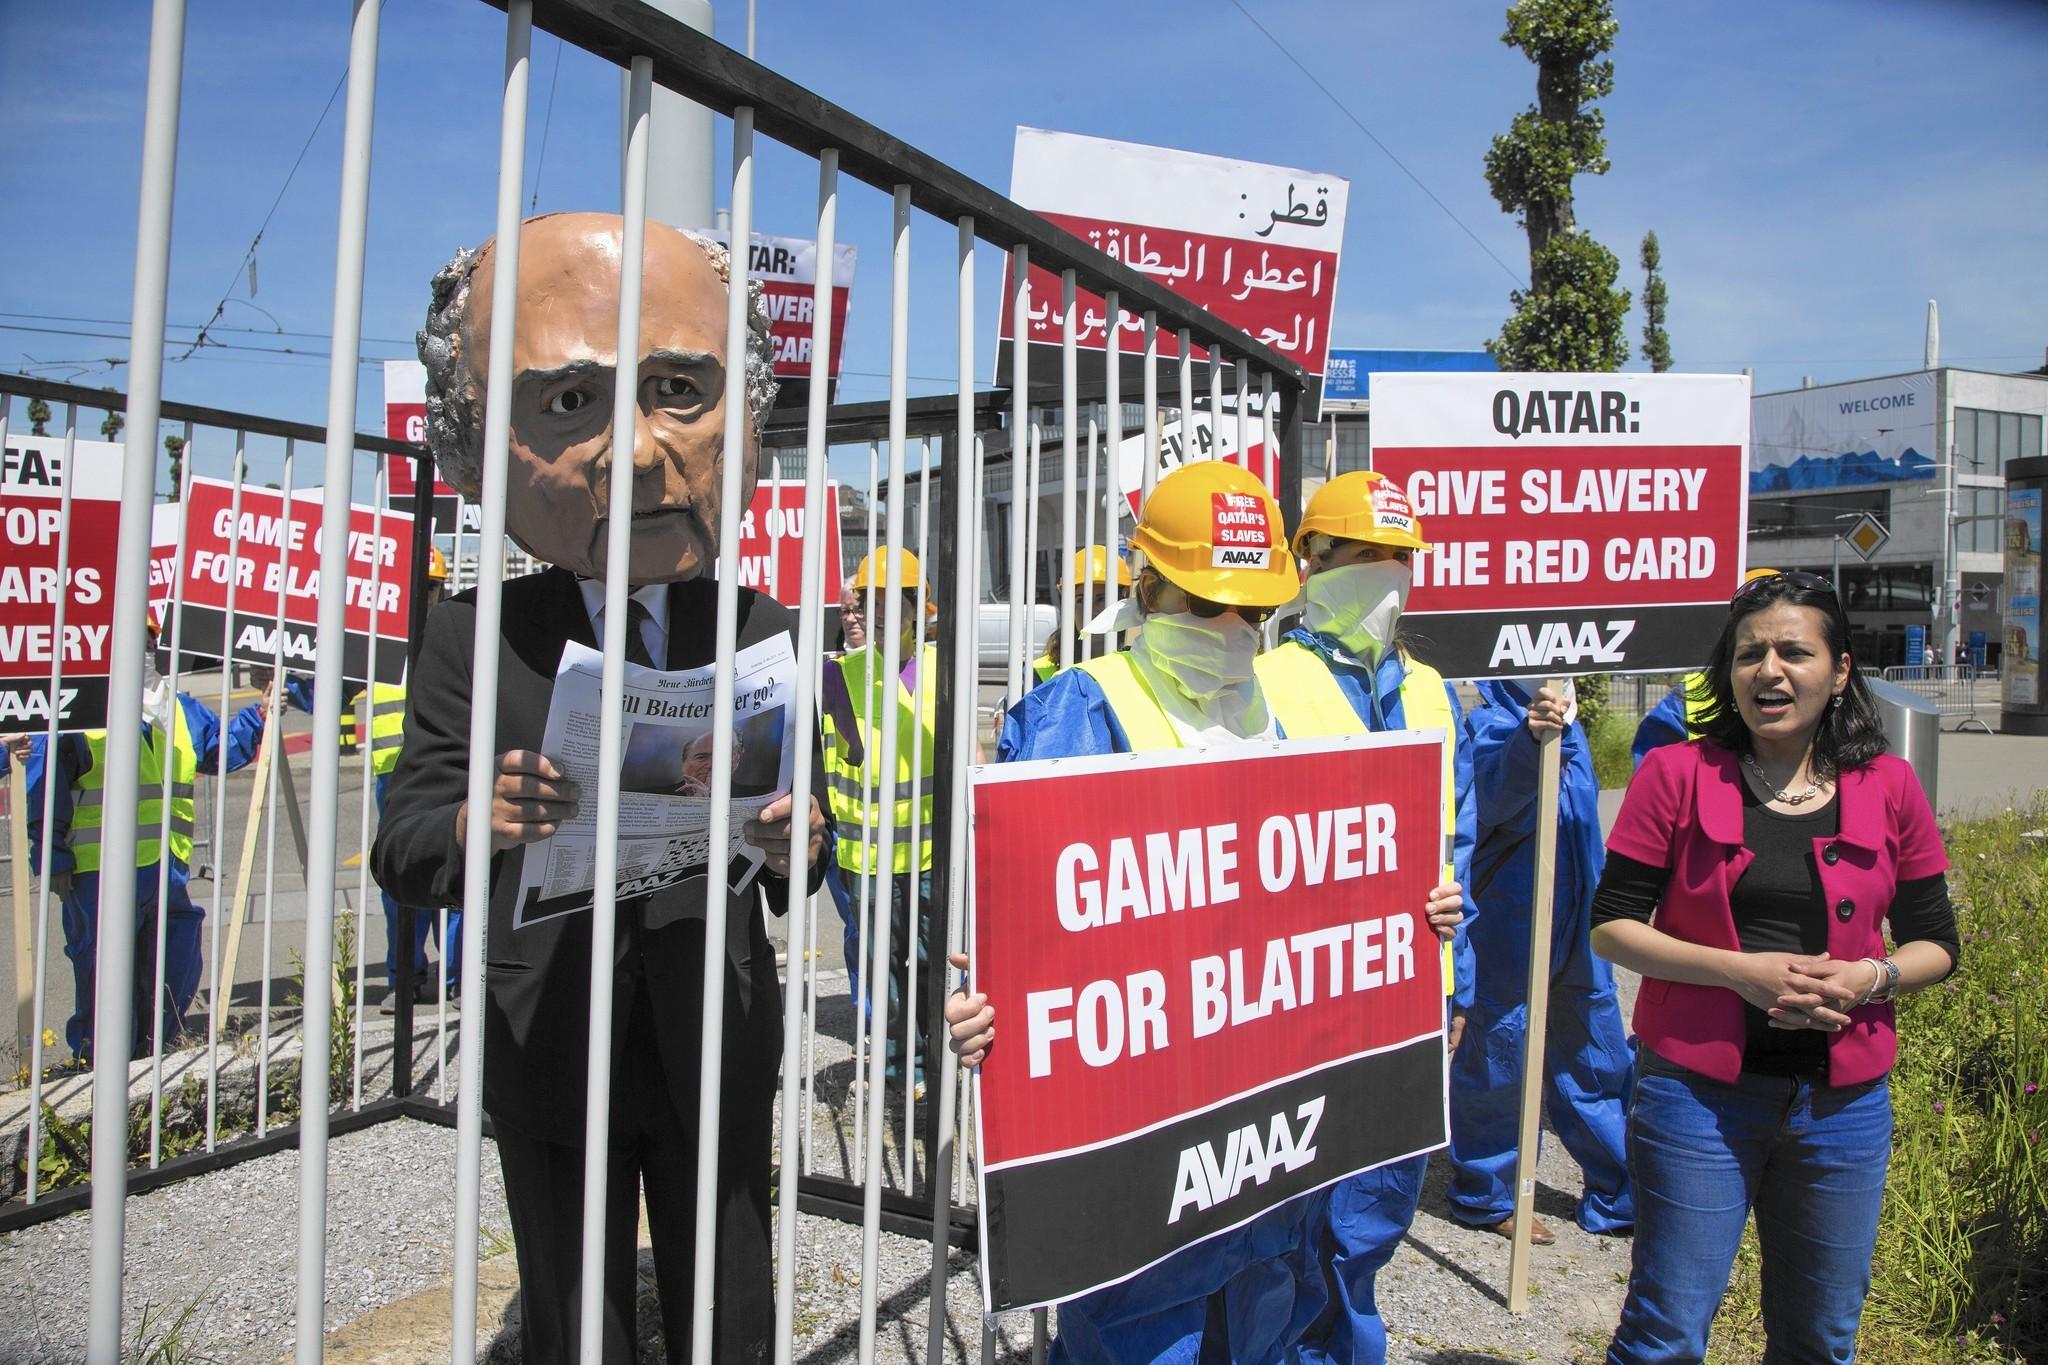 FIFA President Sepp Blatter faces growing pressure to resign